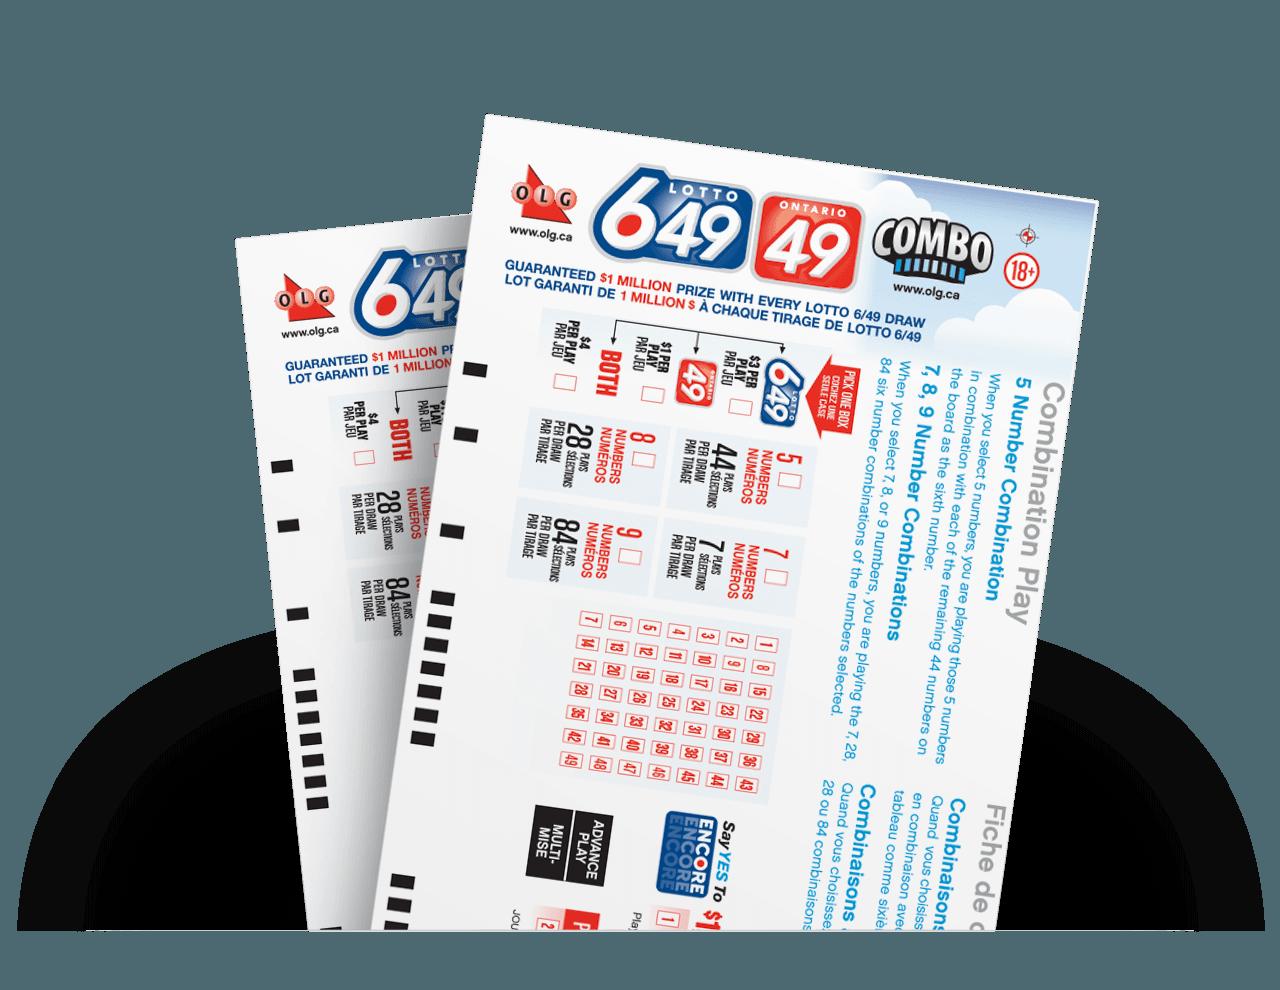 Lotto 6 49 Combination Play